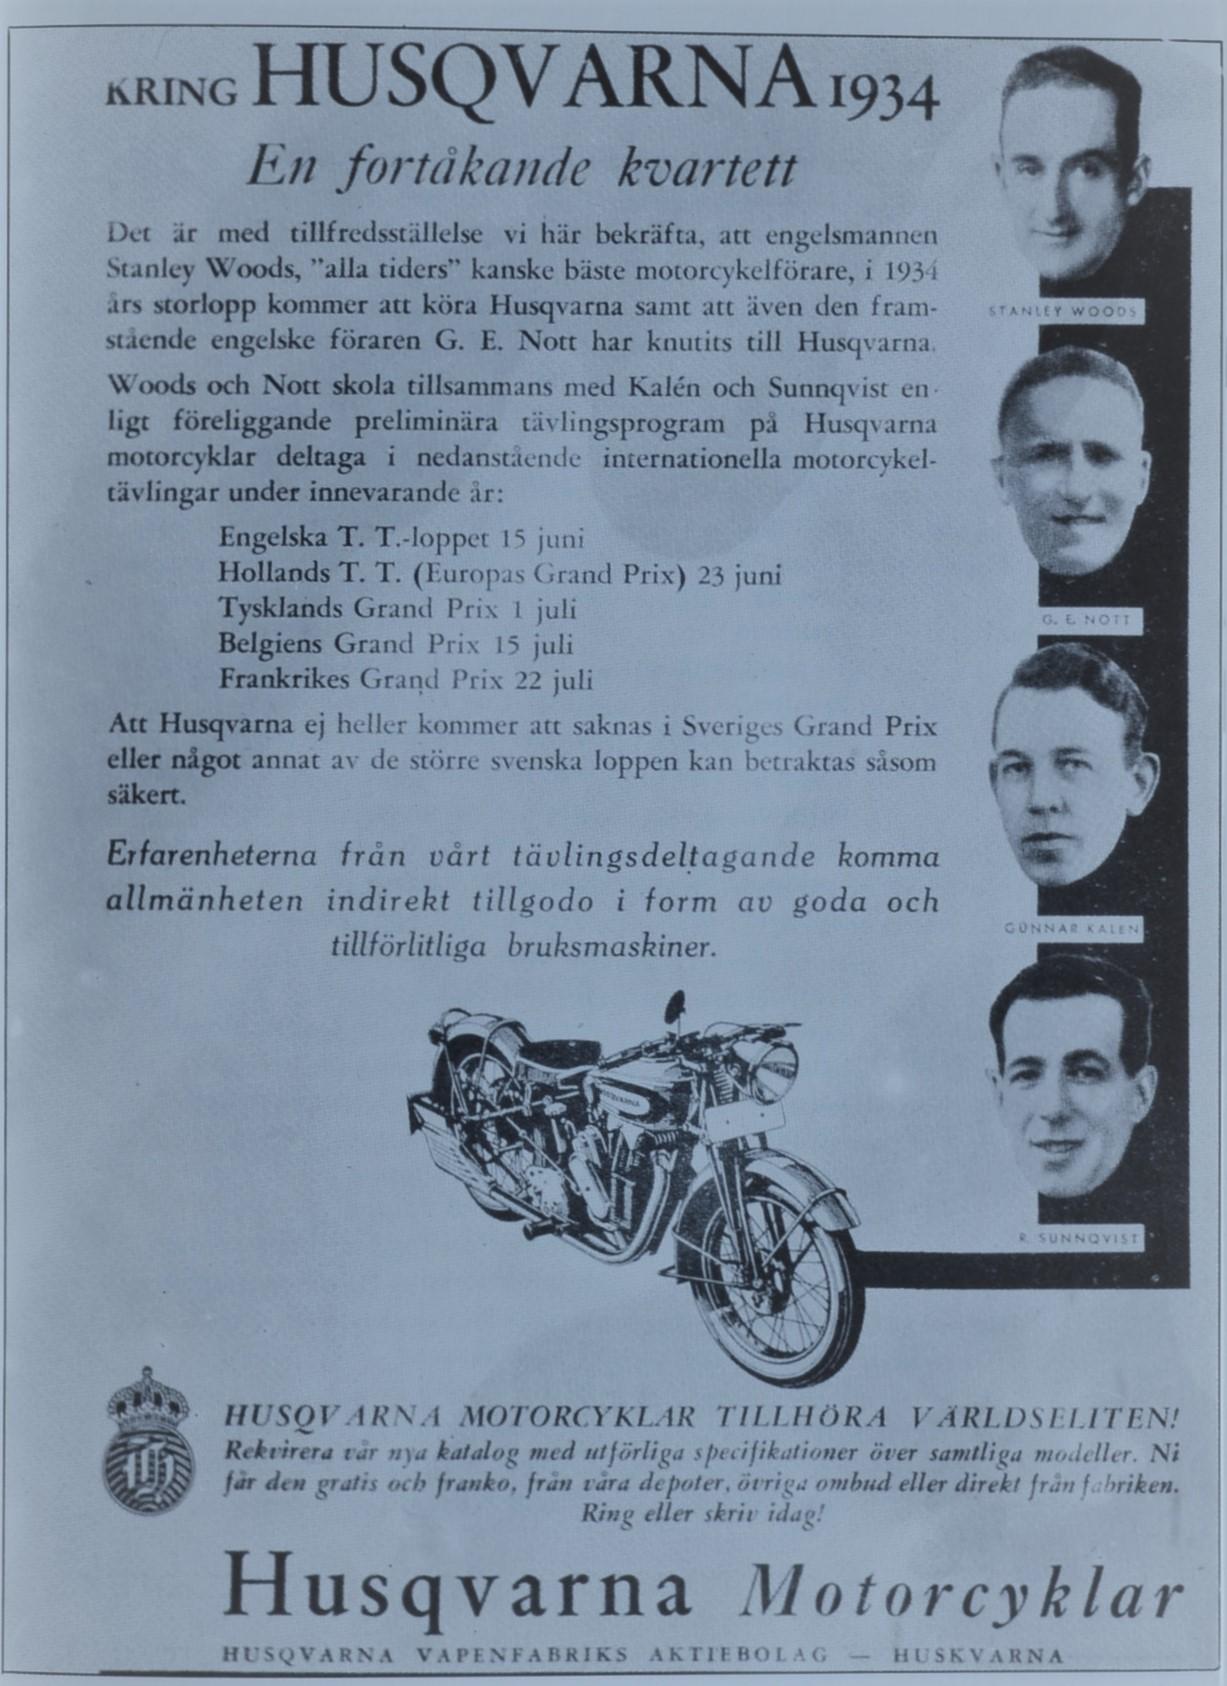 34_hqv_race_ad Povestea legendarului Stanley Woods - Husqvarna